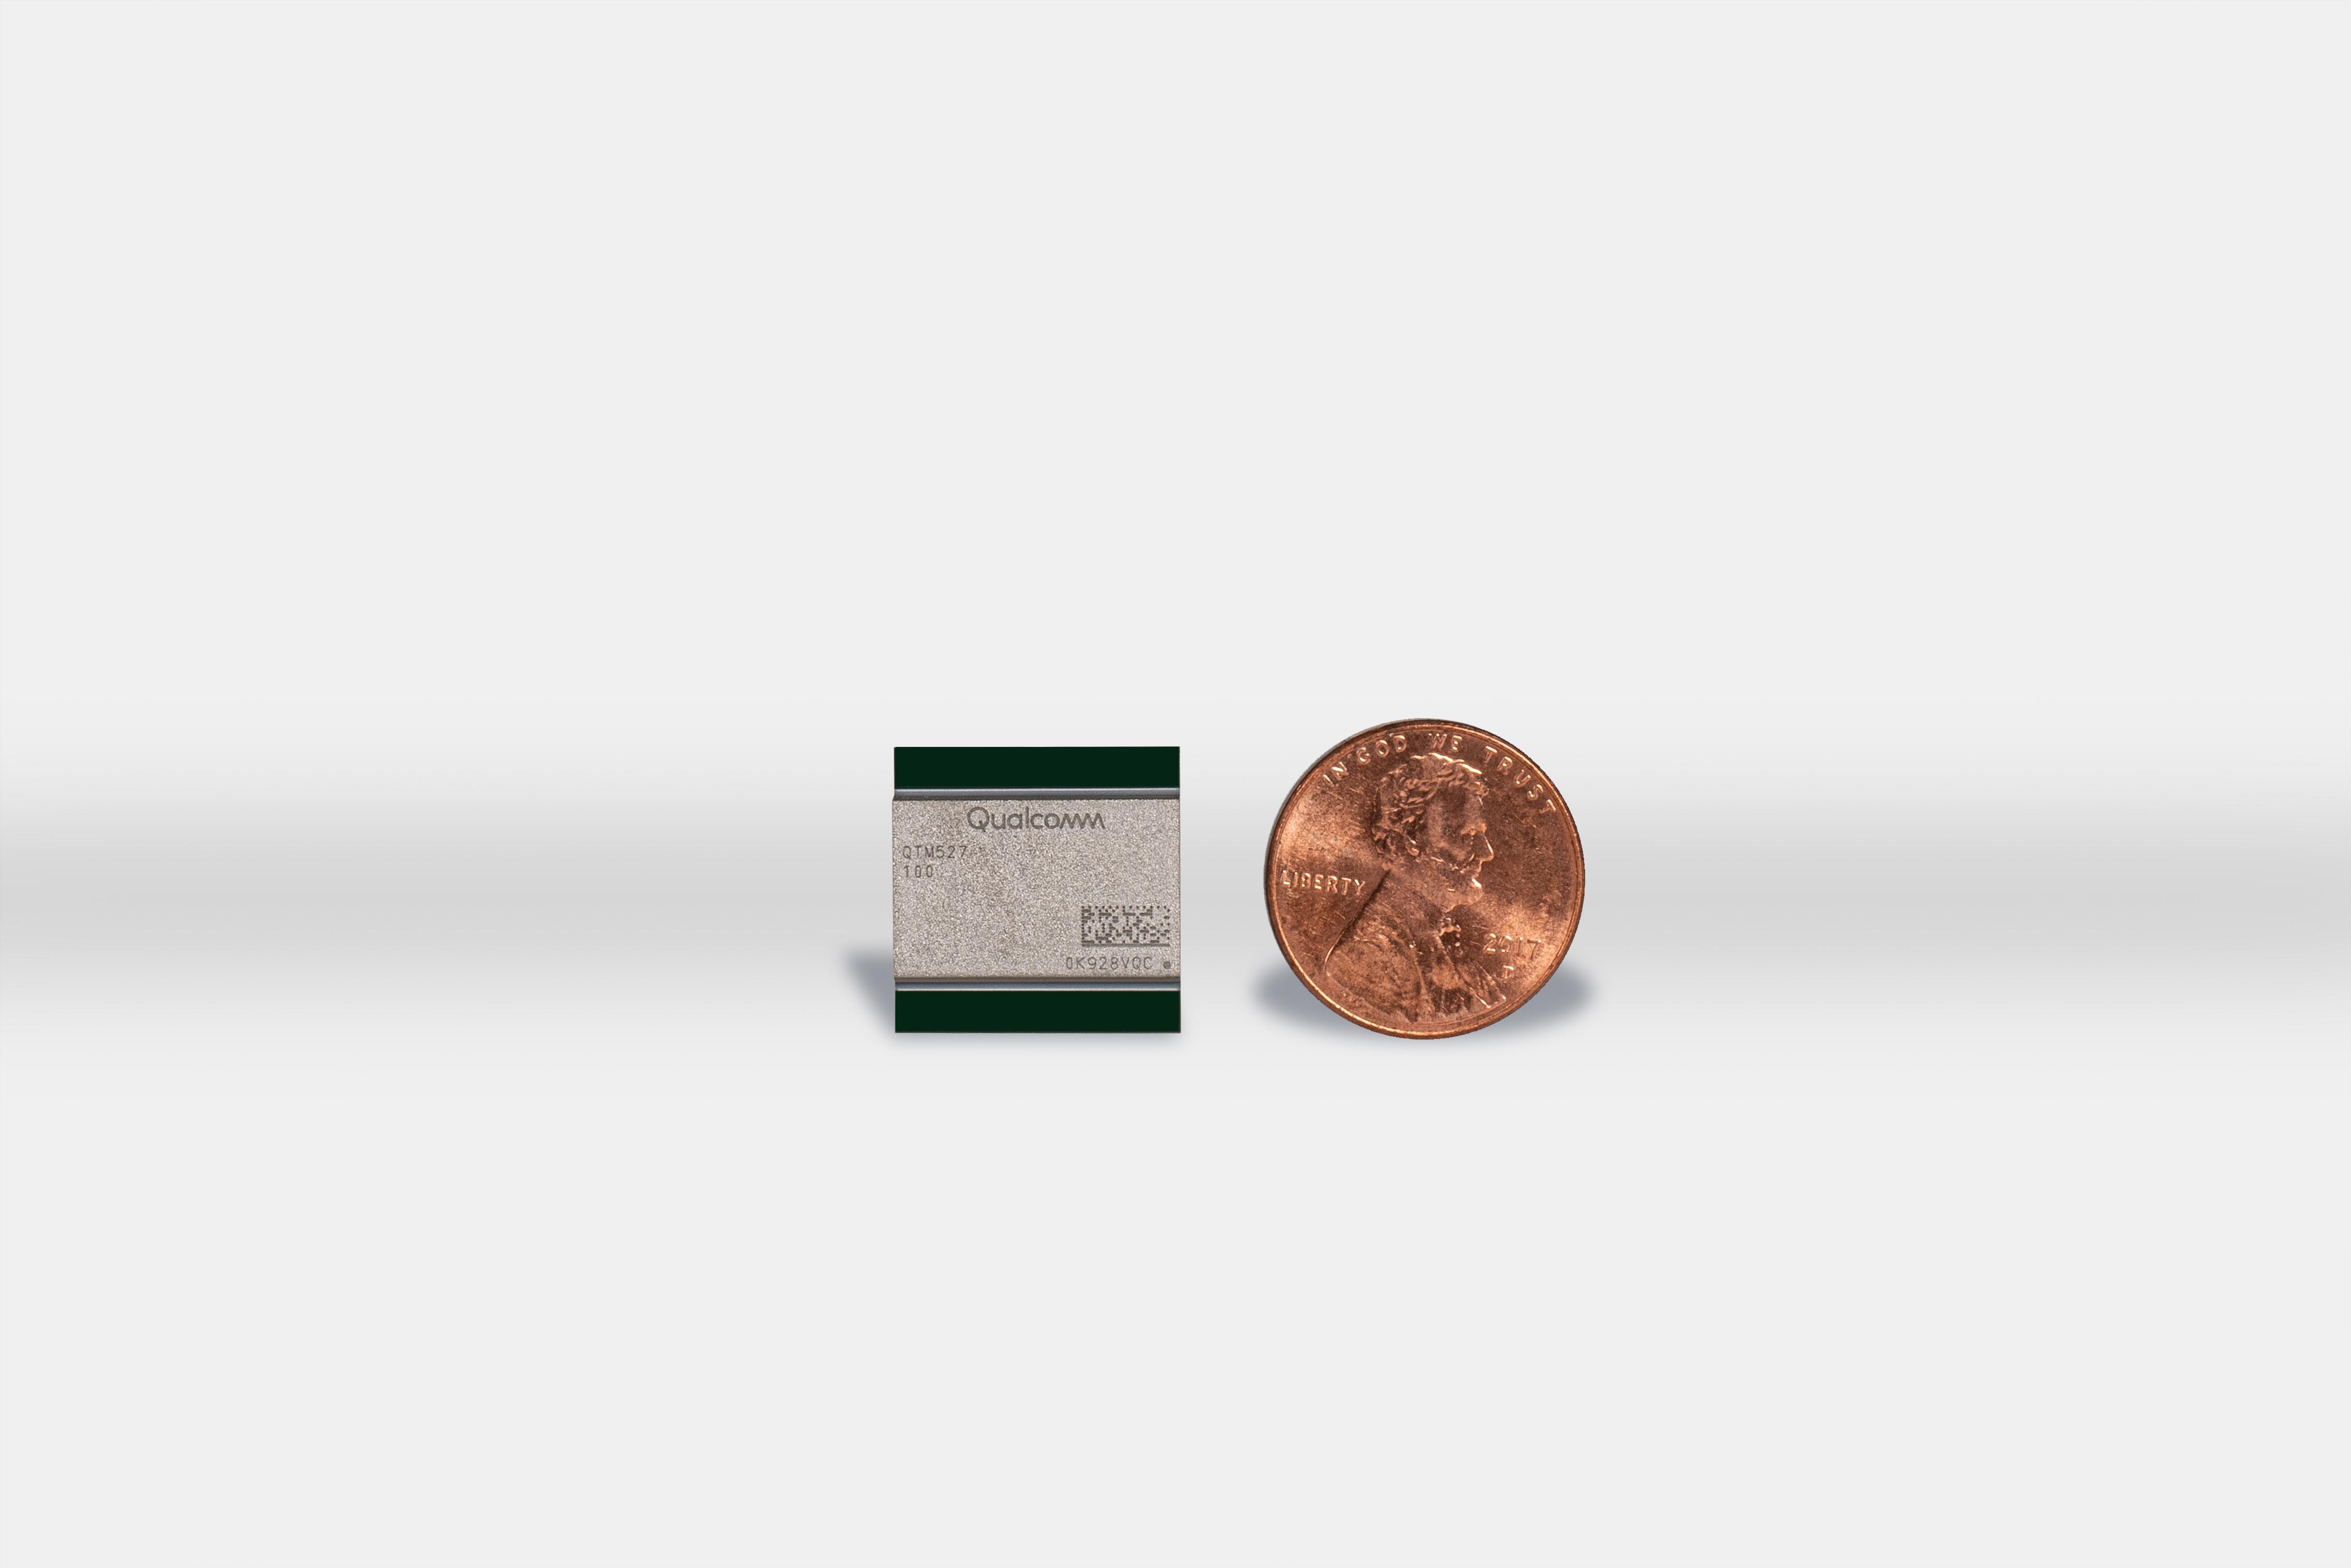 Qualcomm宣布推出全球首个面向5G固定无线接入的全集成增程毫米波解决方案